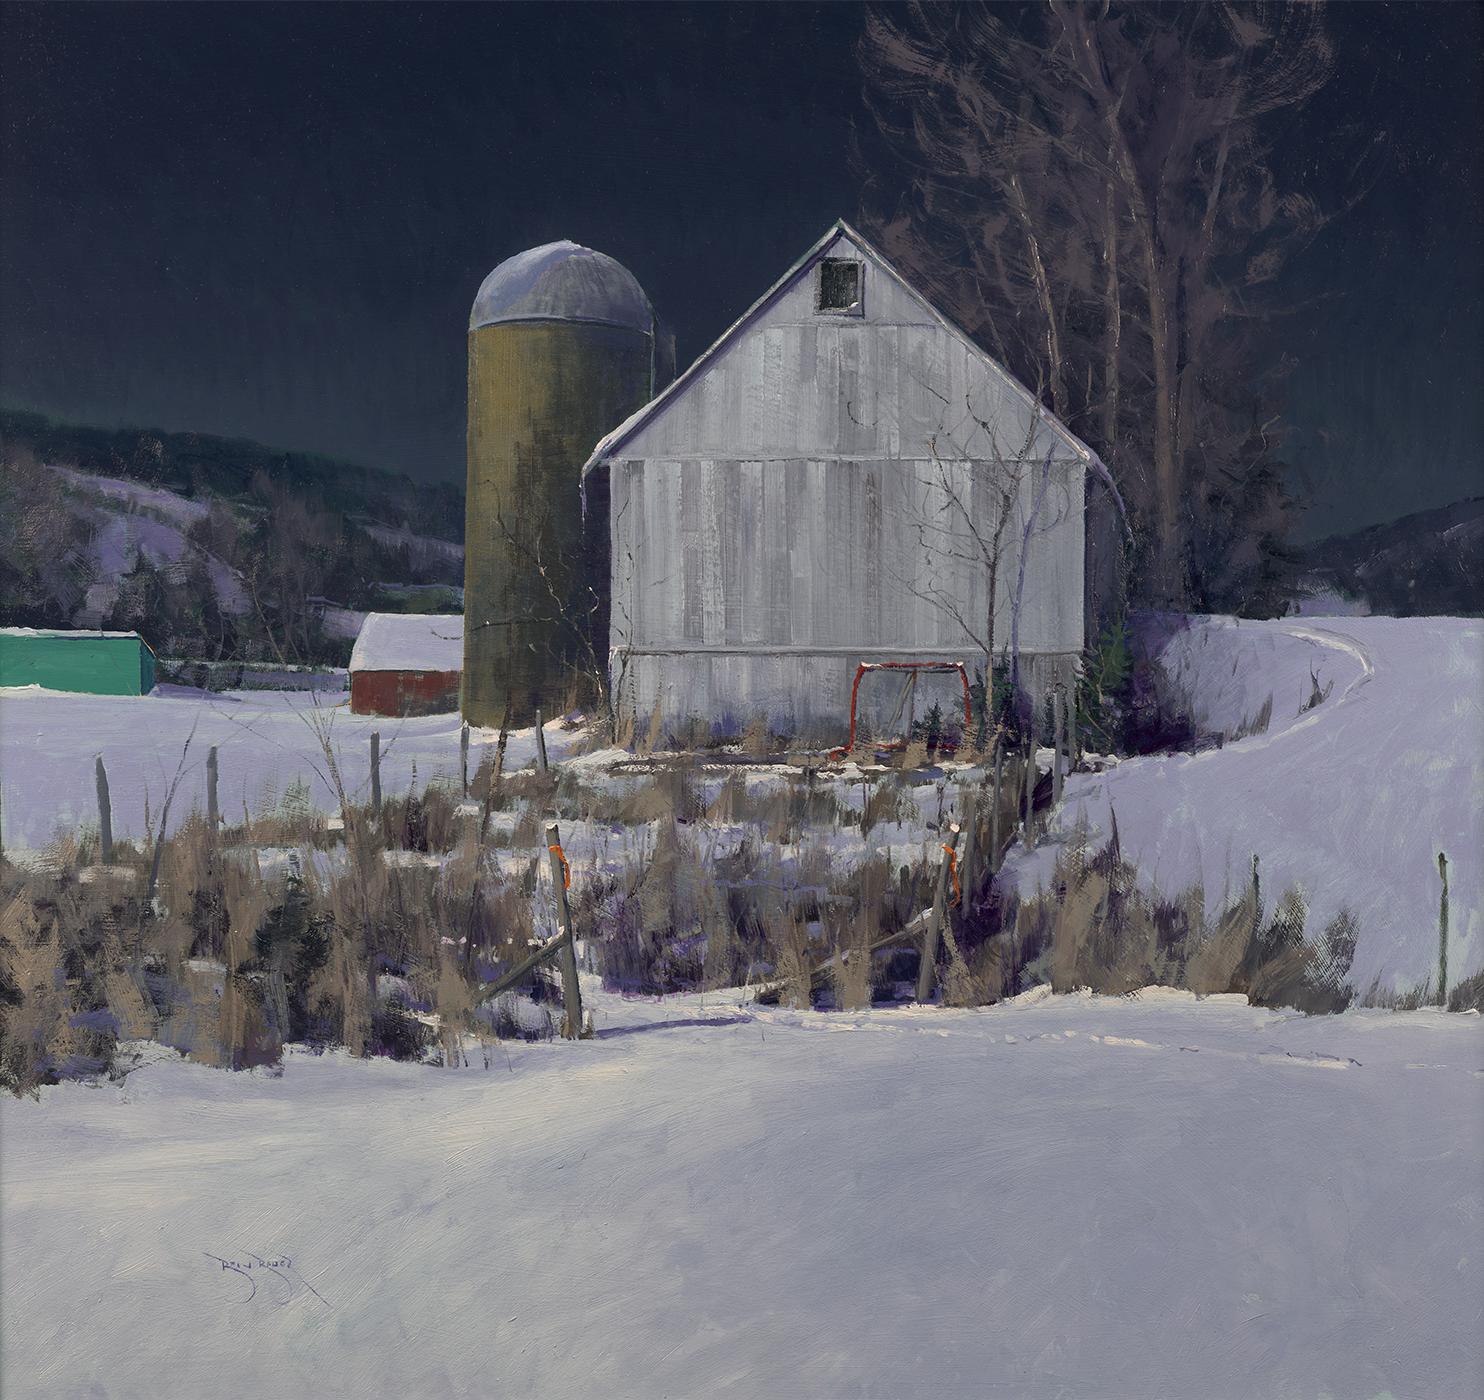 ben_bauer_bb1142_a_driftless_barn_yard_at_midnight.jpg